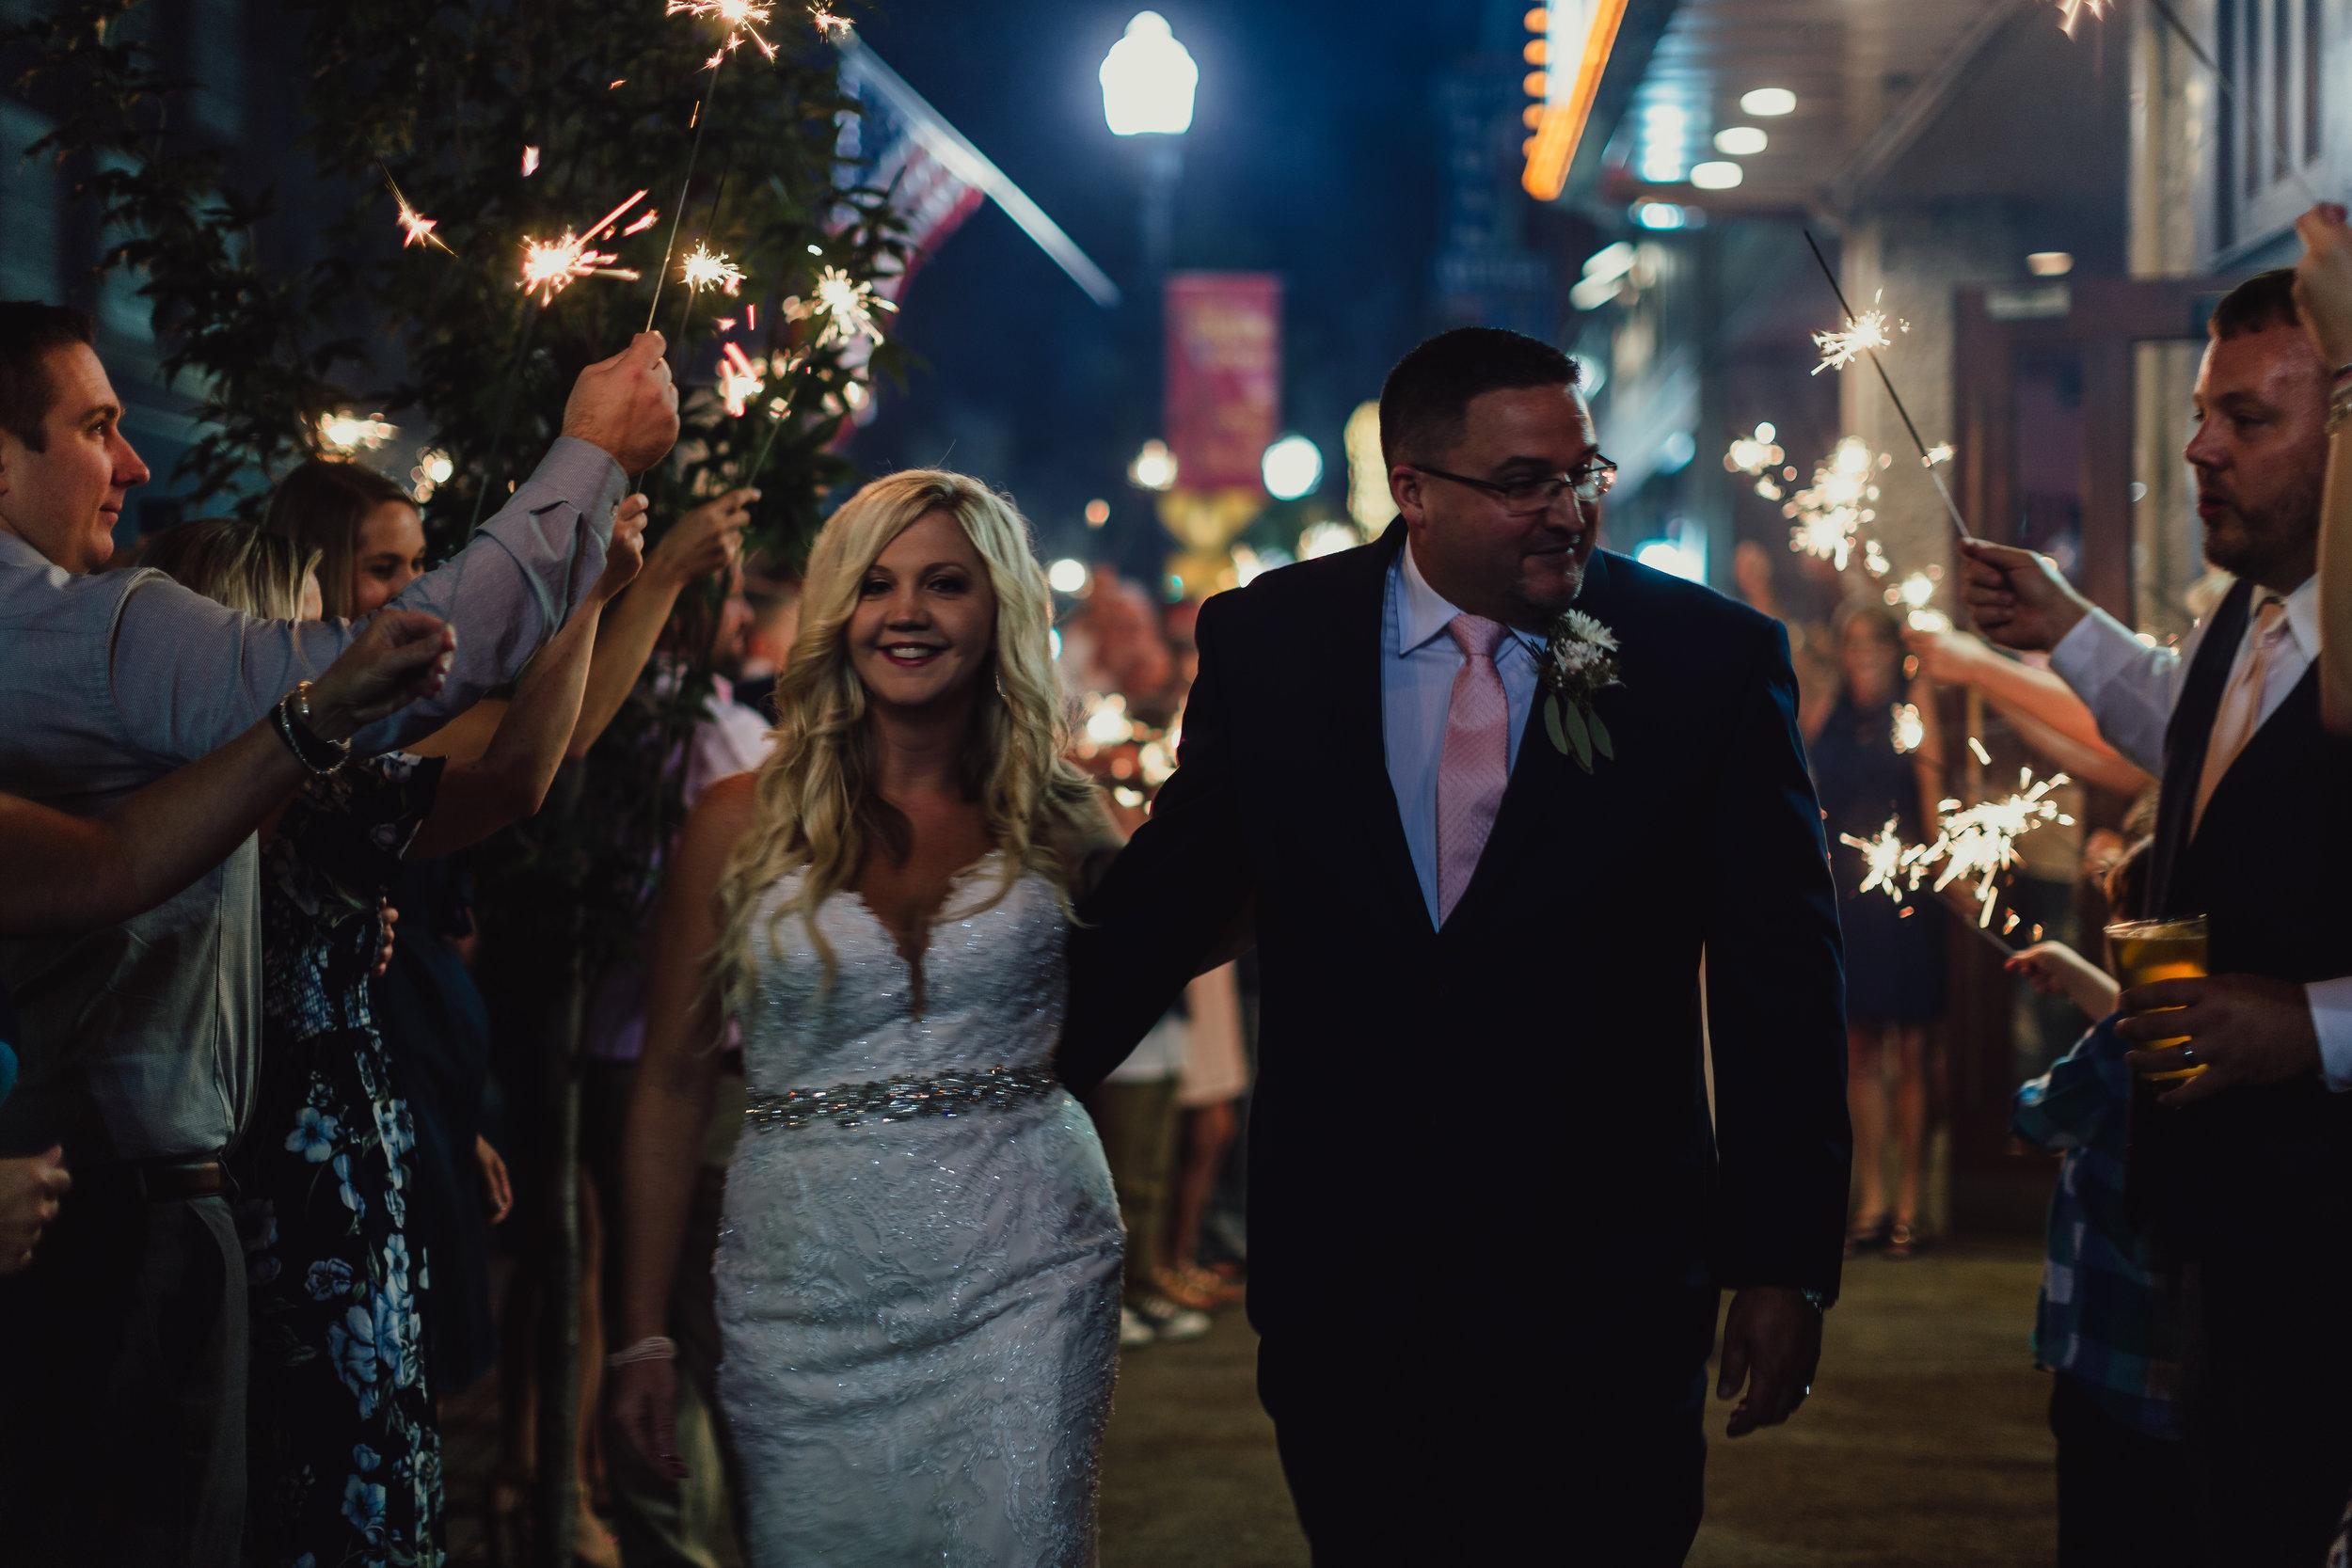 east-tn-wedding-photographer-tennessee-elopement-photographer-kingsport-tn-wedding-photographer (973 of 1001).jpg